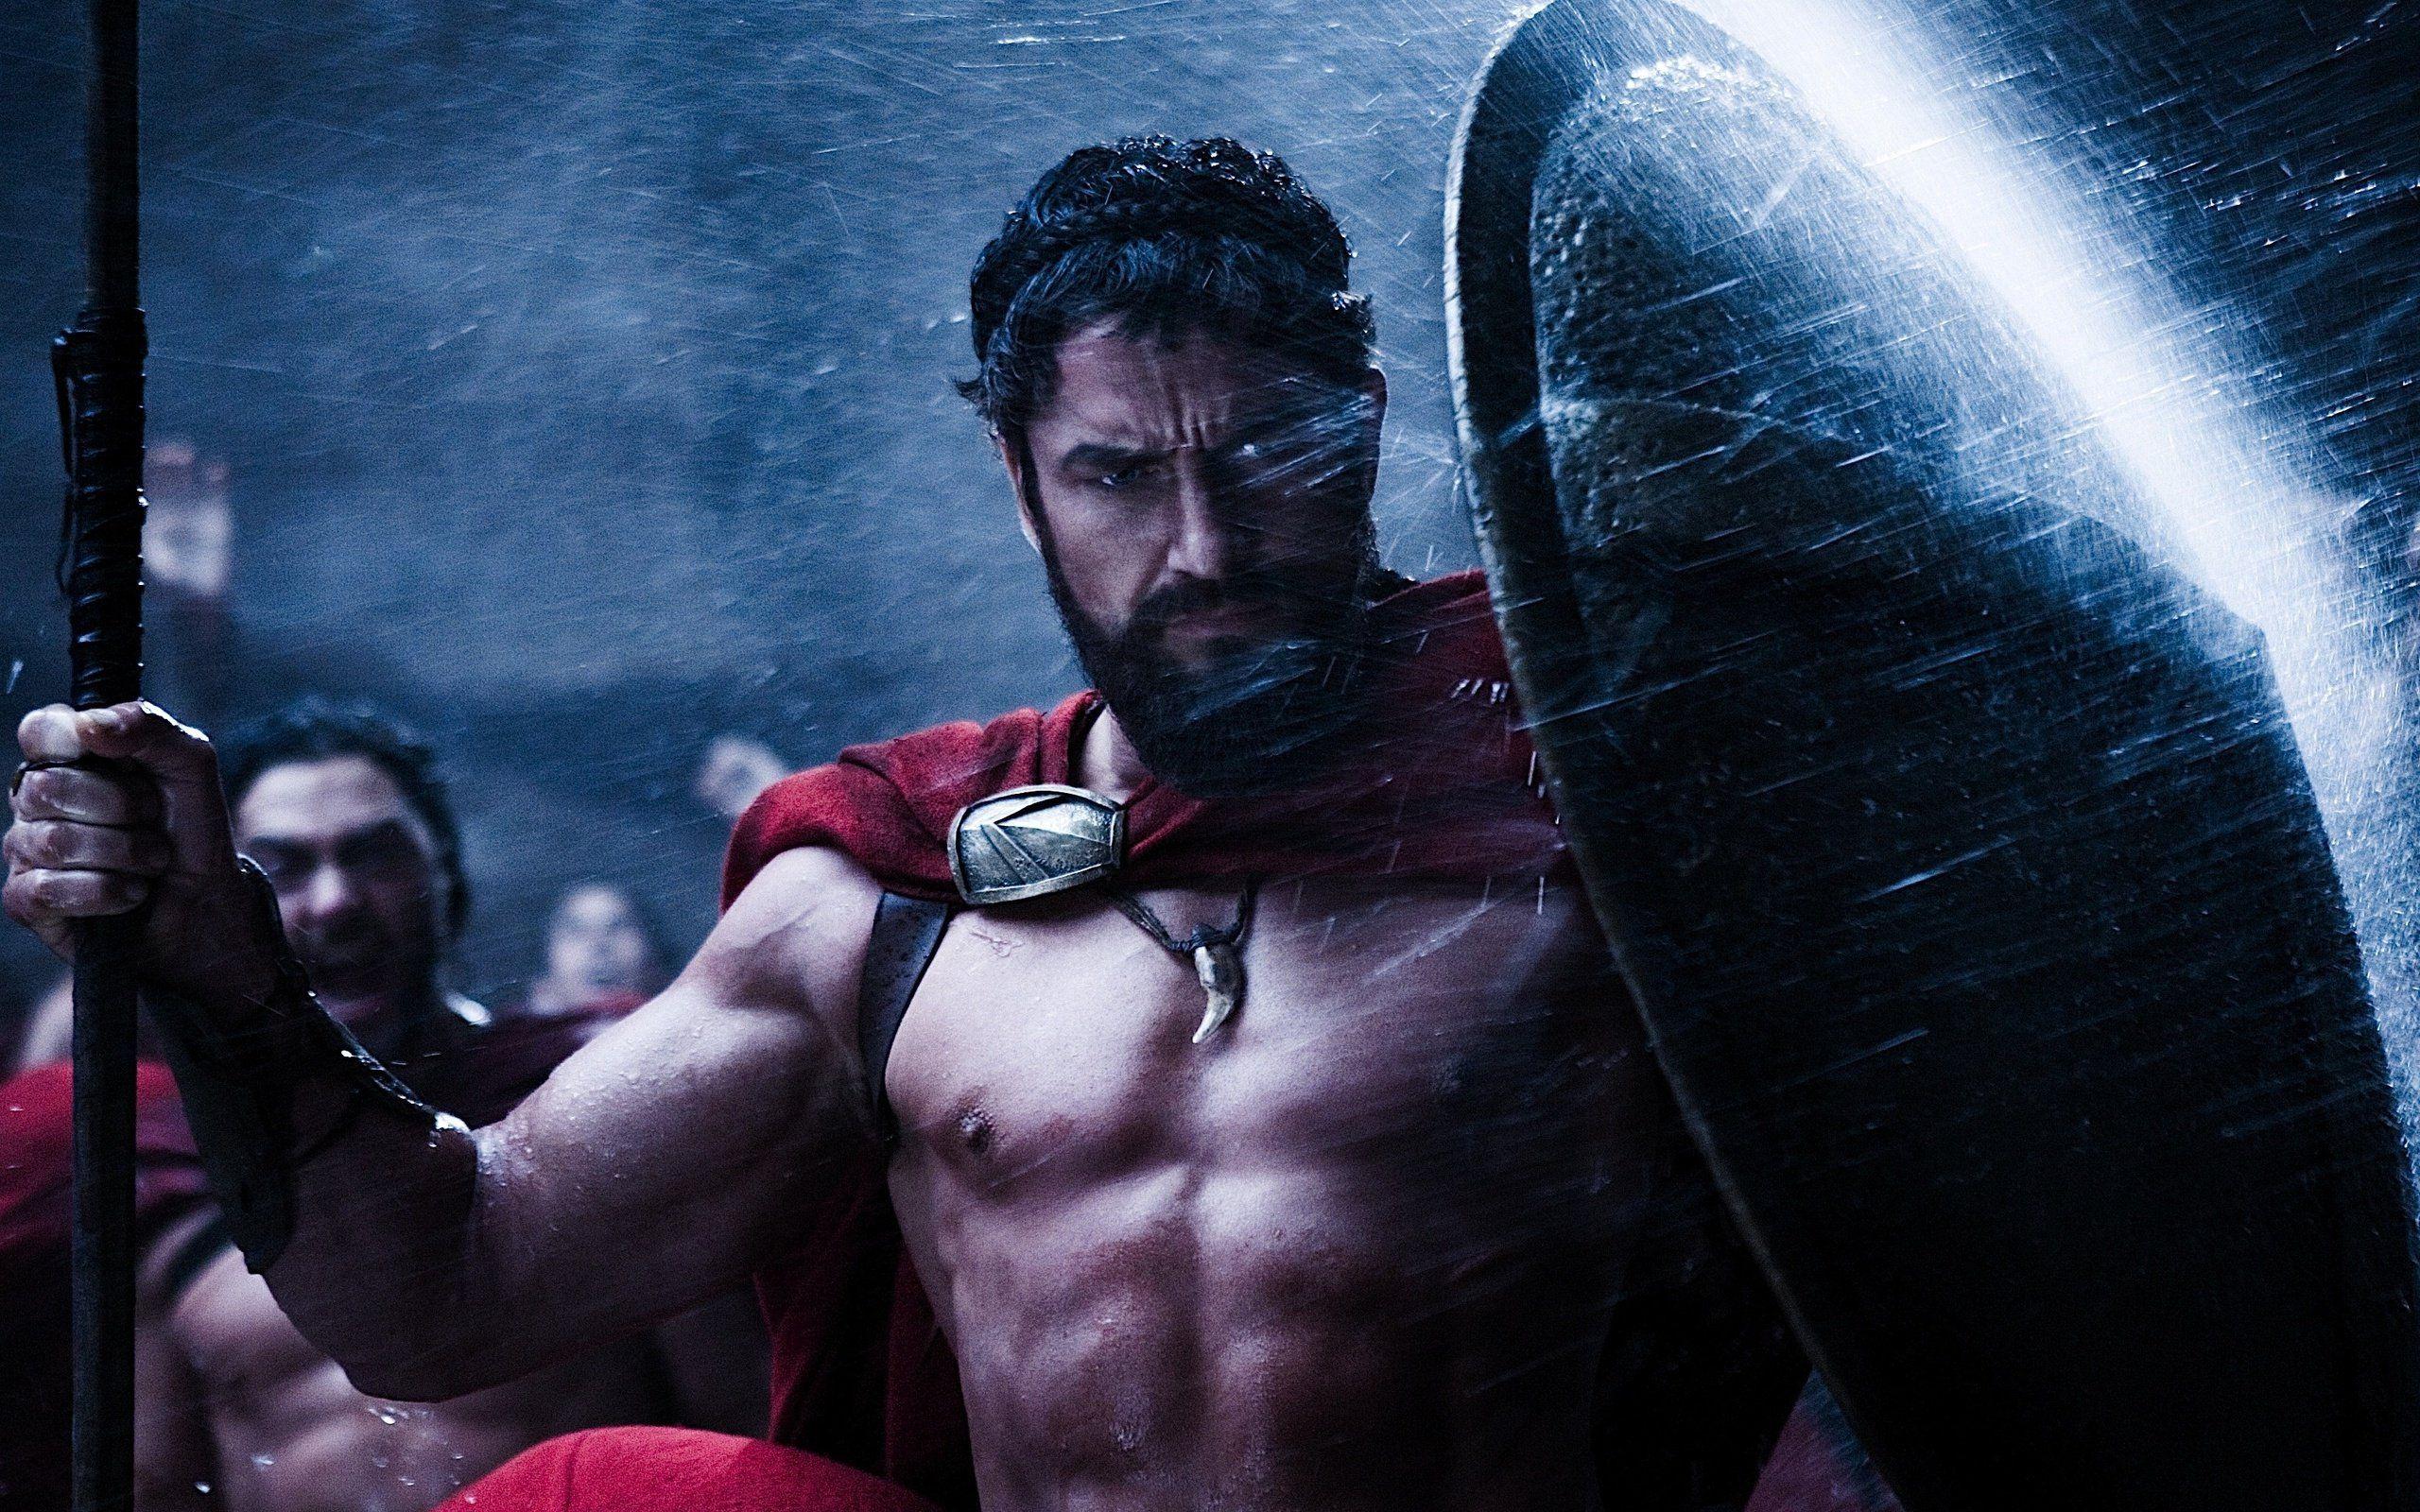 открытки 300 спартанцев бойся